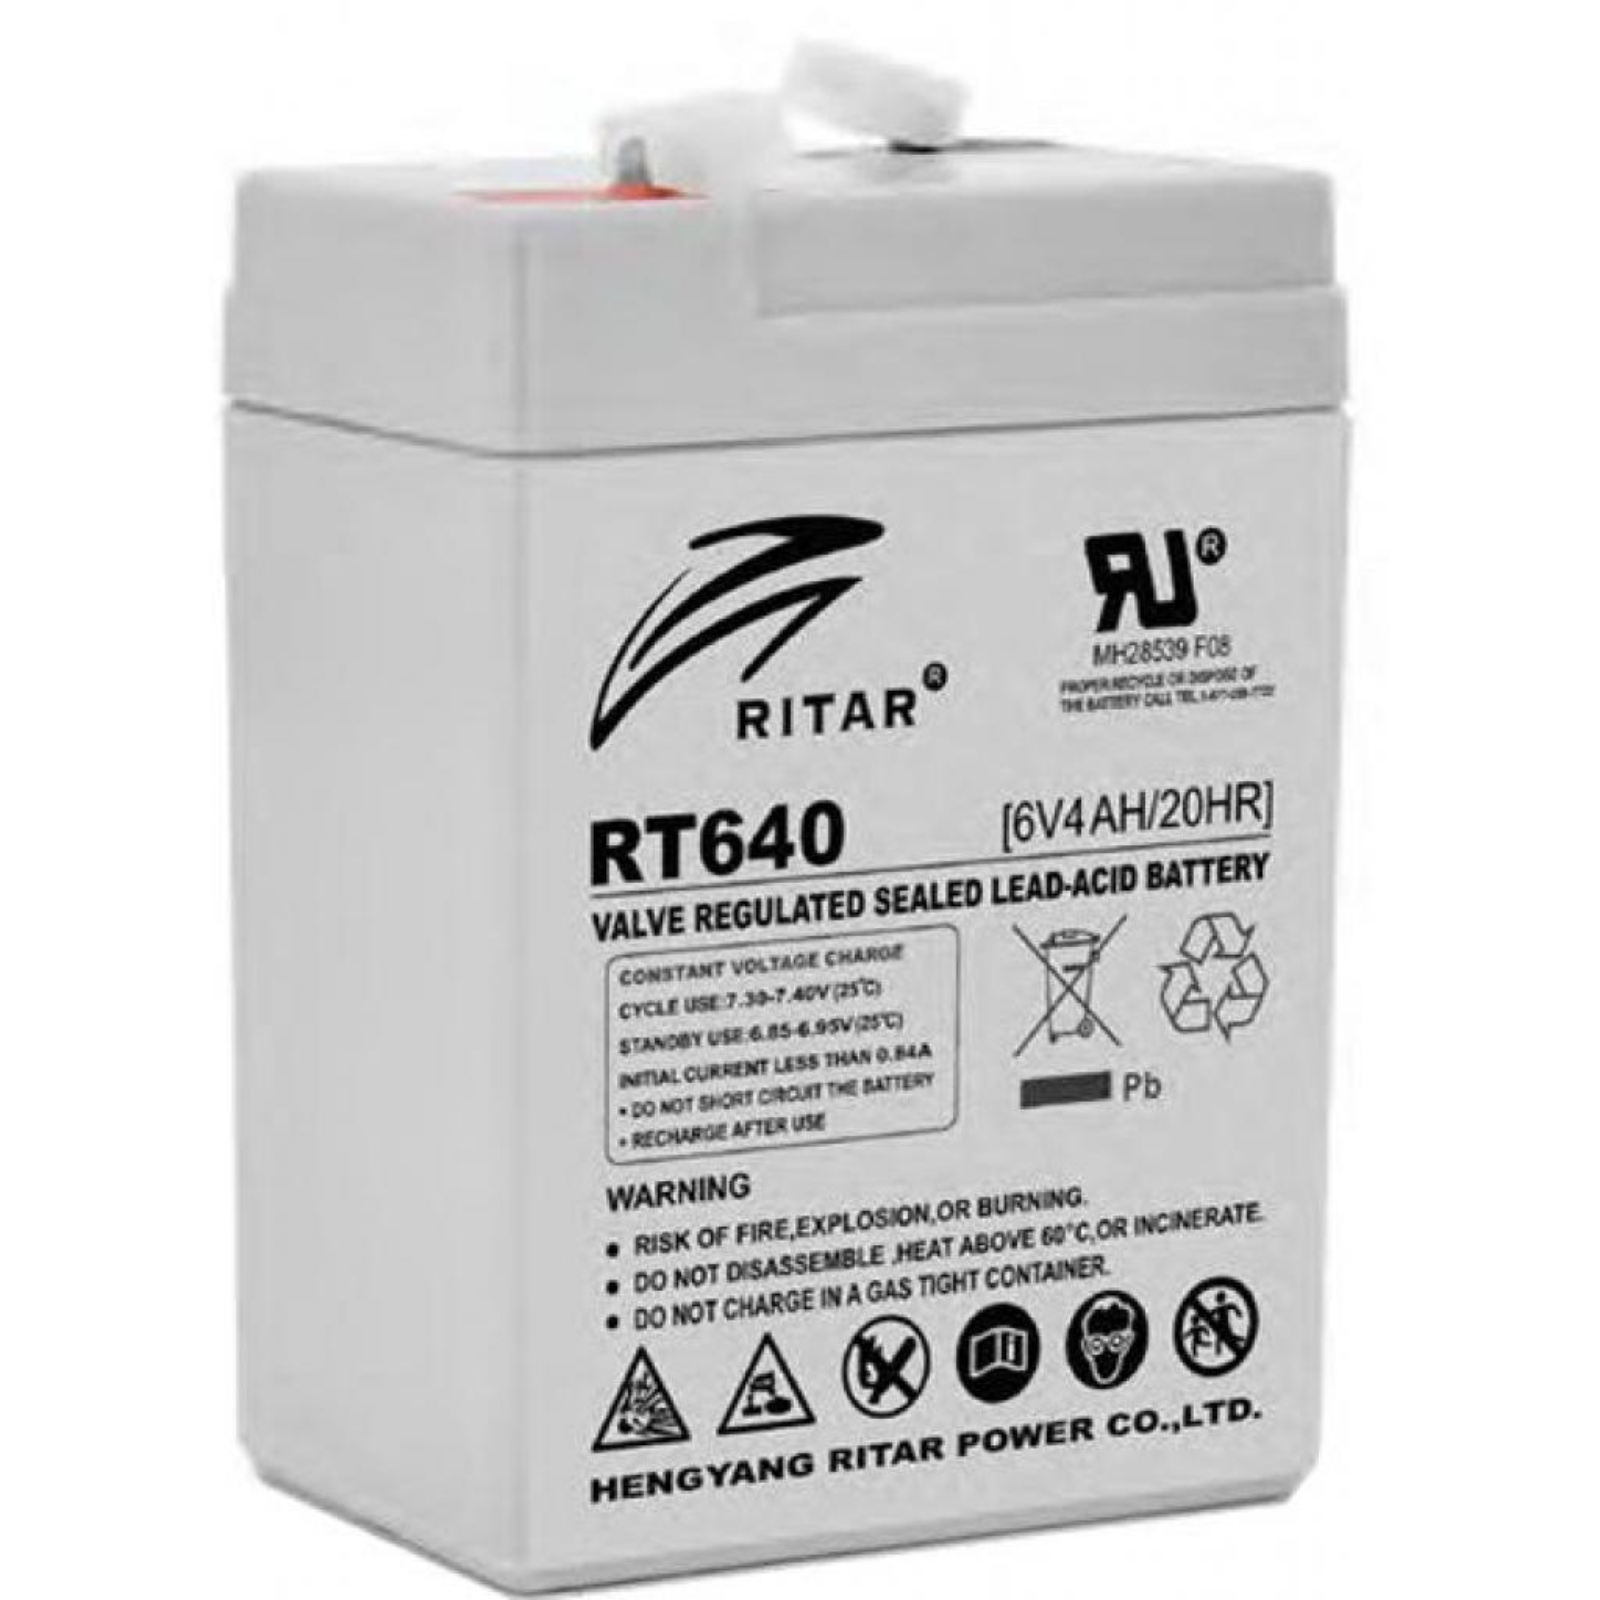 Батарея к ИБП Ritar AGM RT645, 6V-4Ah (RT640)